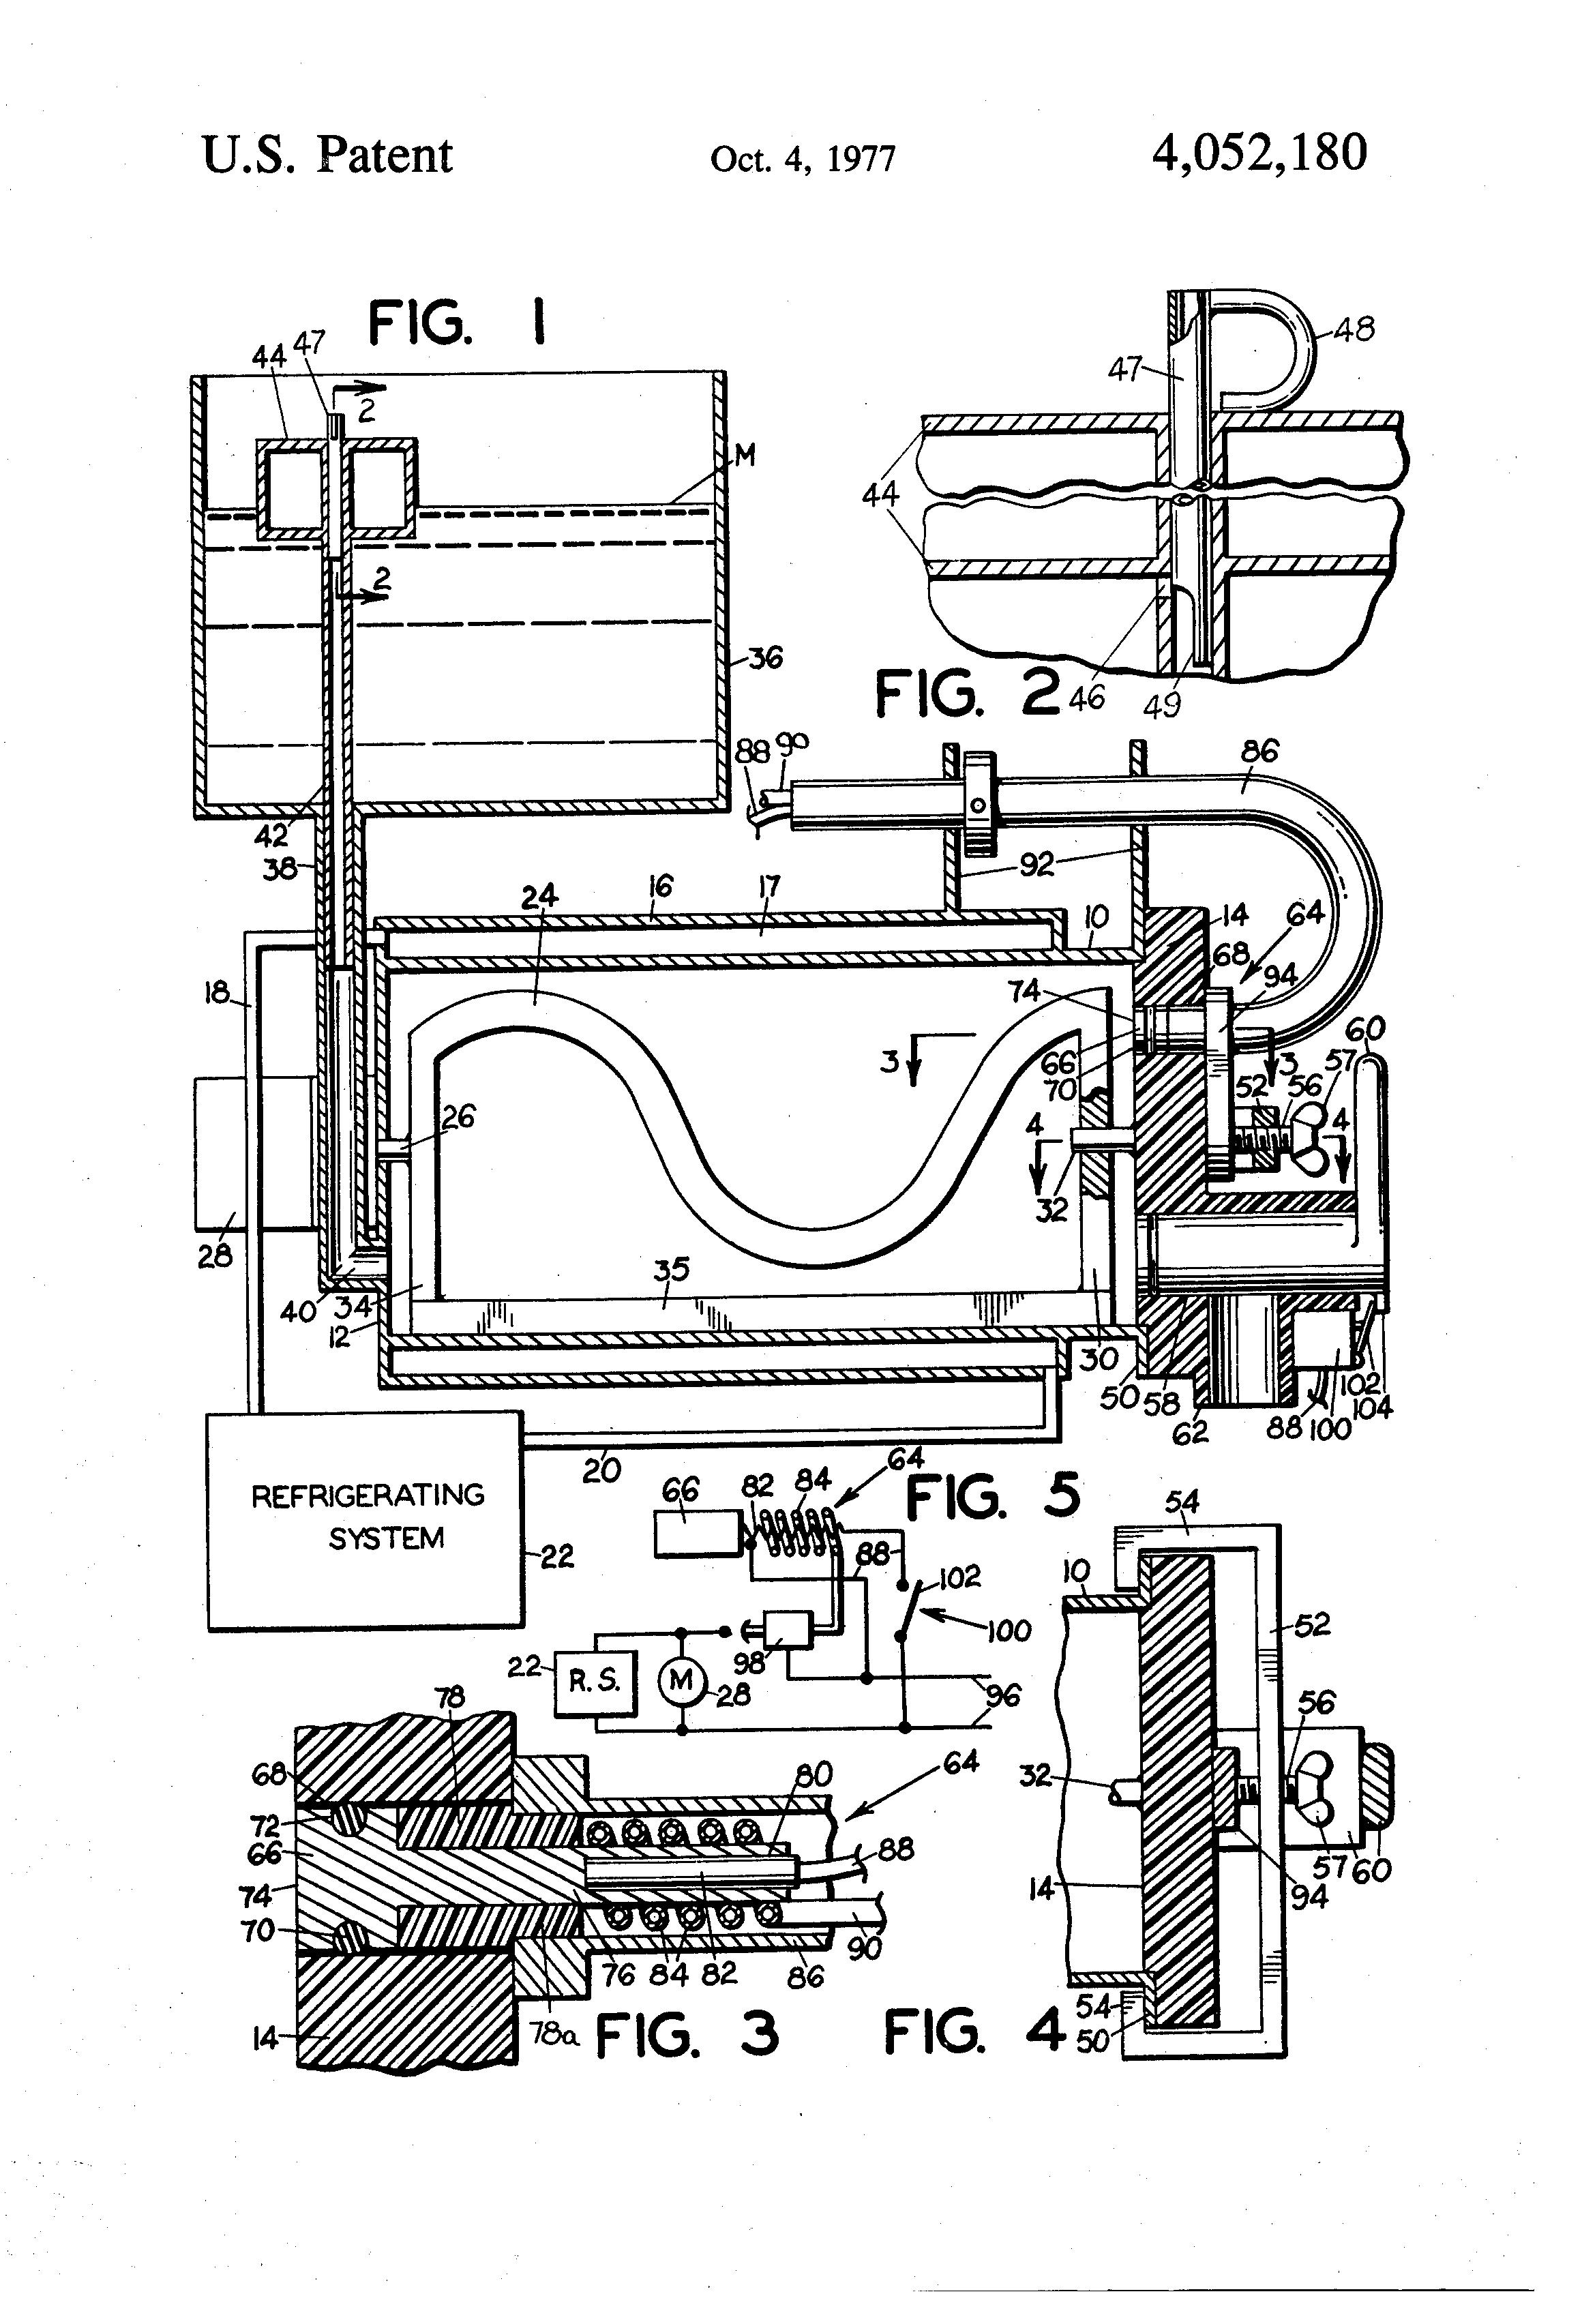 soft ice cream machine wiring diagram soft diy wiring diagrams patent us4052180 soft ice cream machine google patents